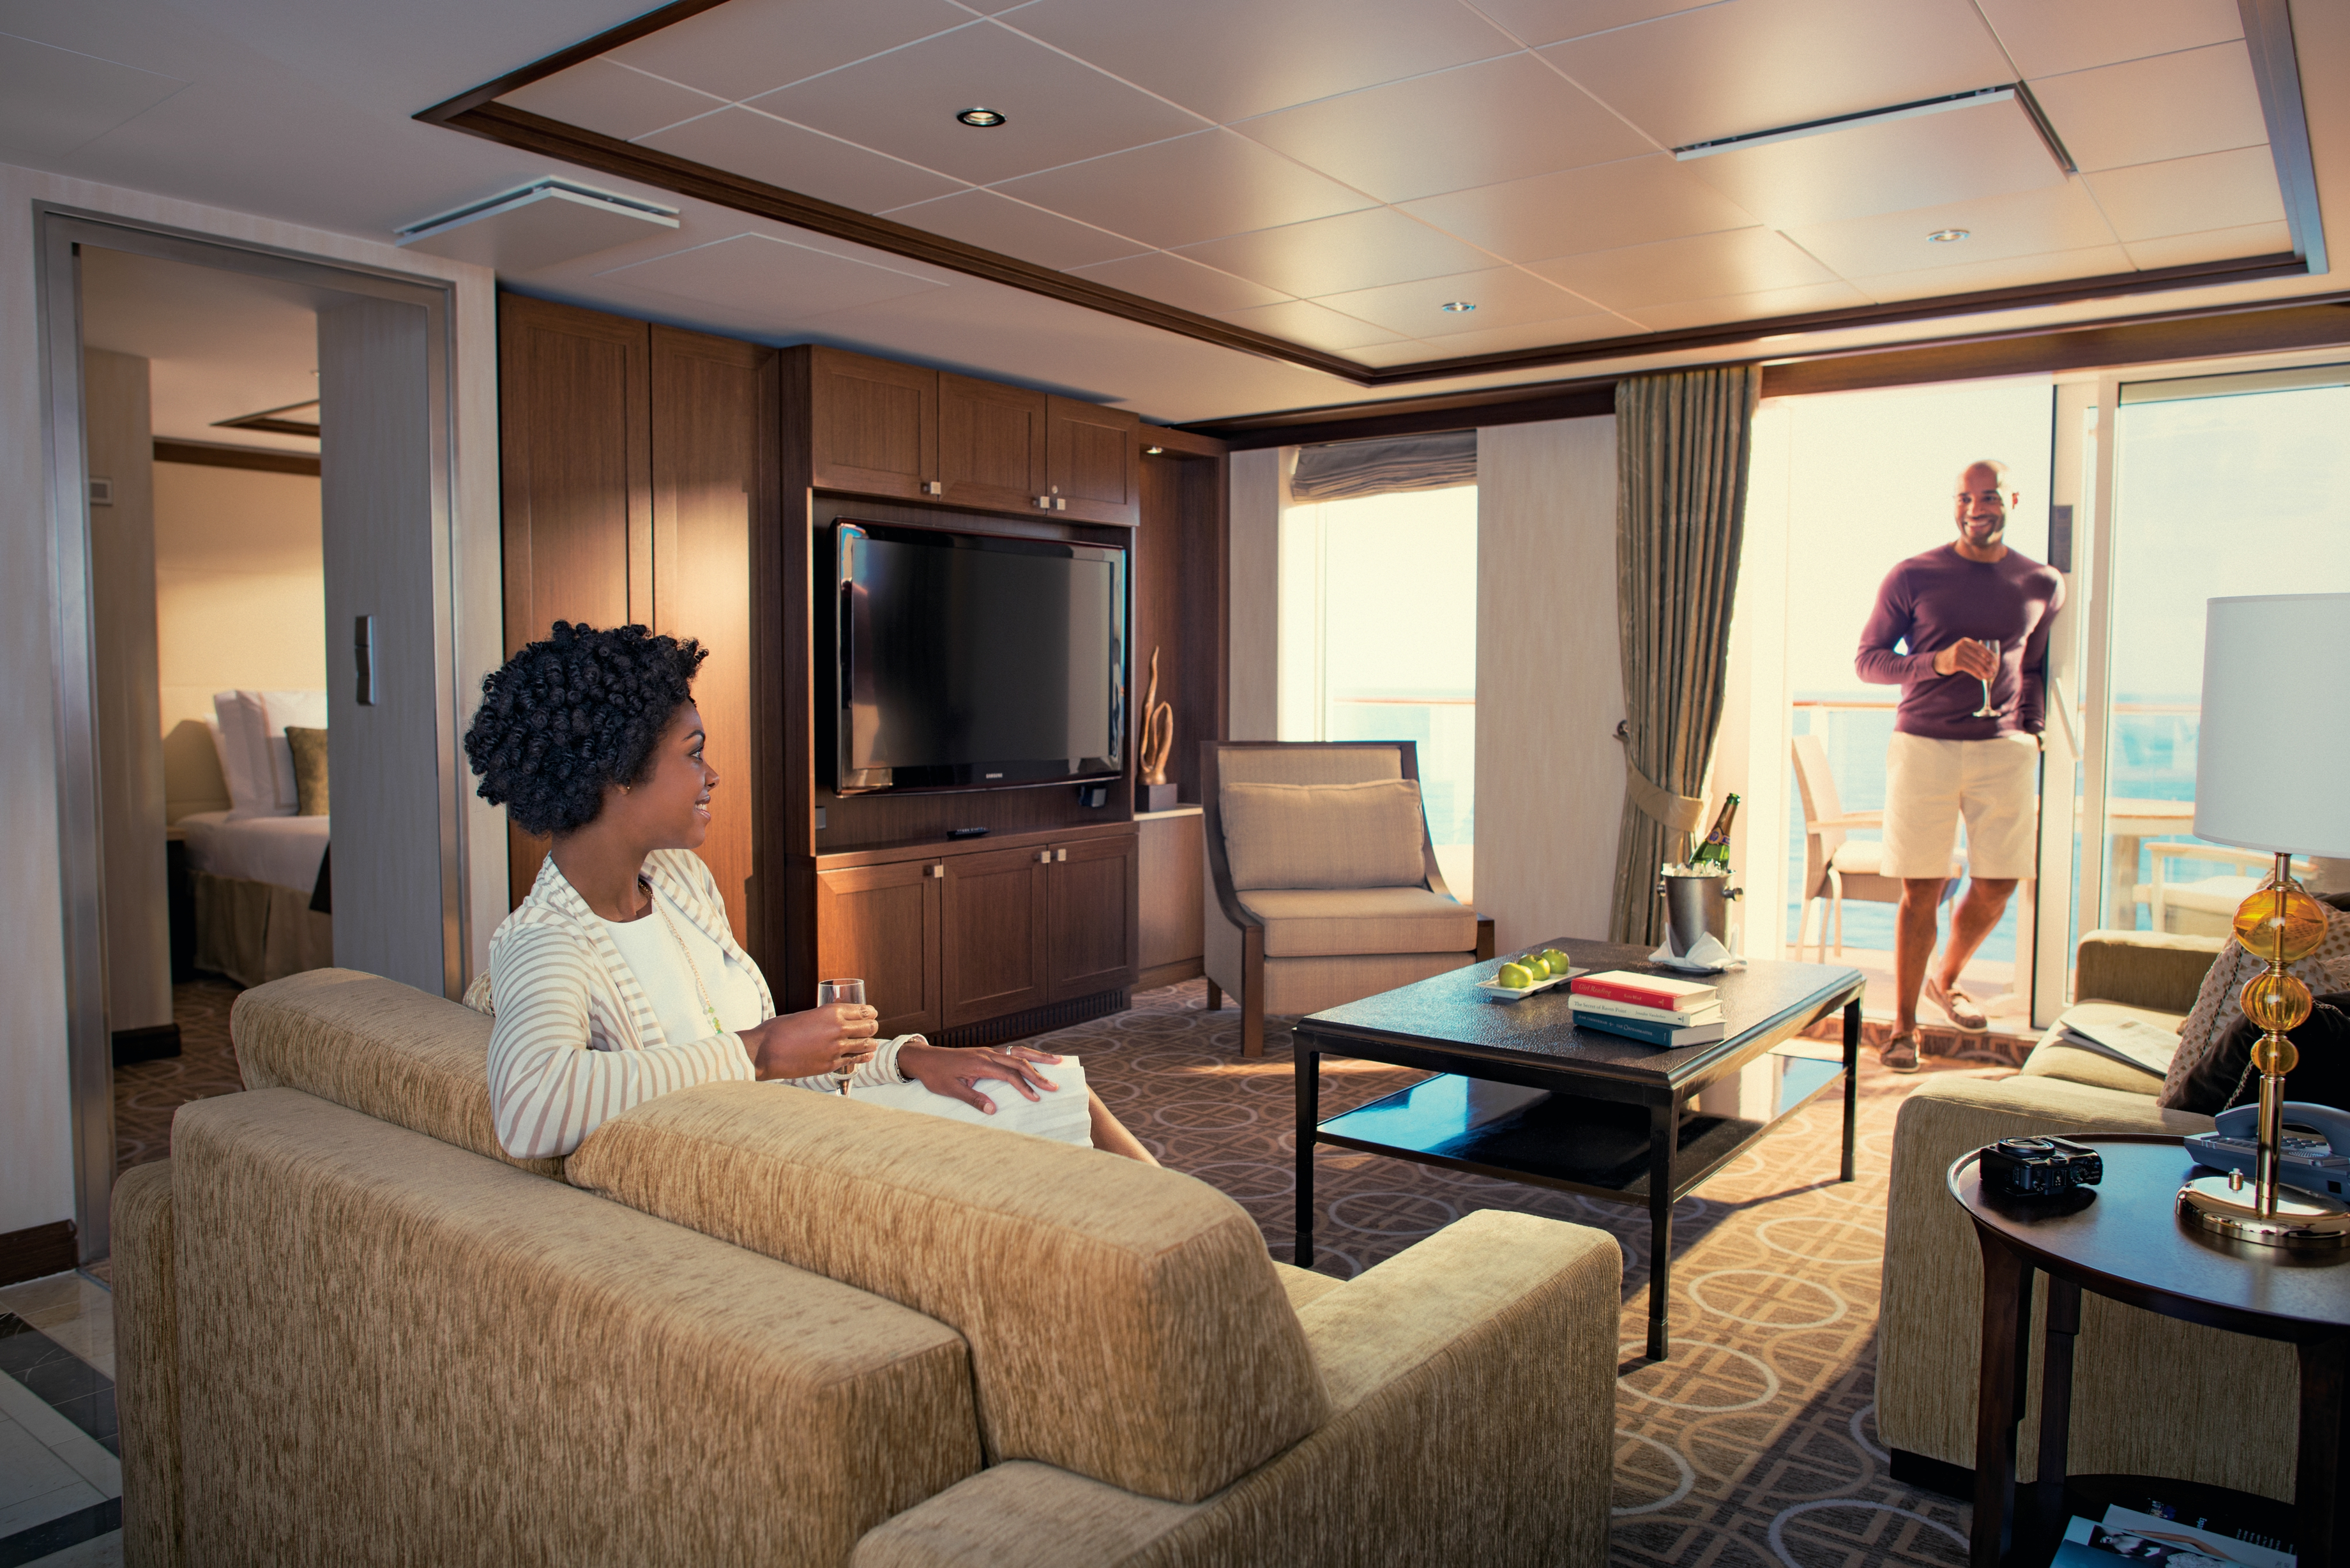 celebrity cruises celebrity equinox royal suite.jpg